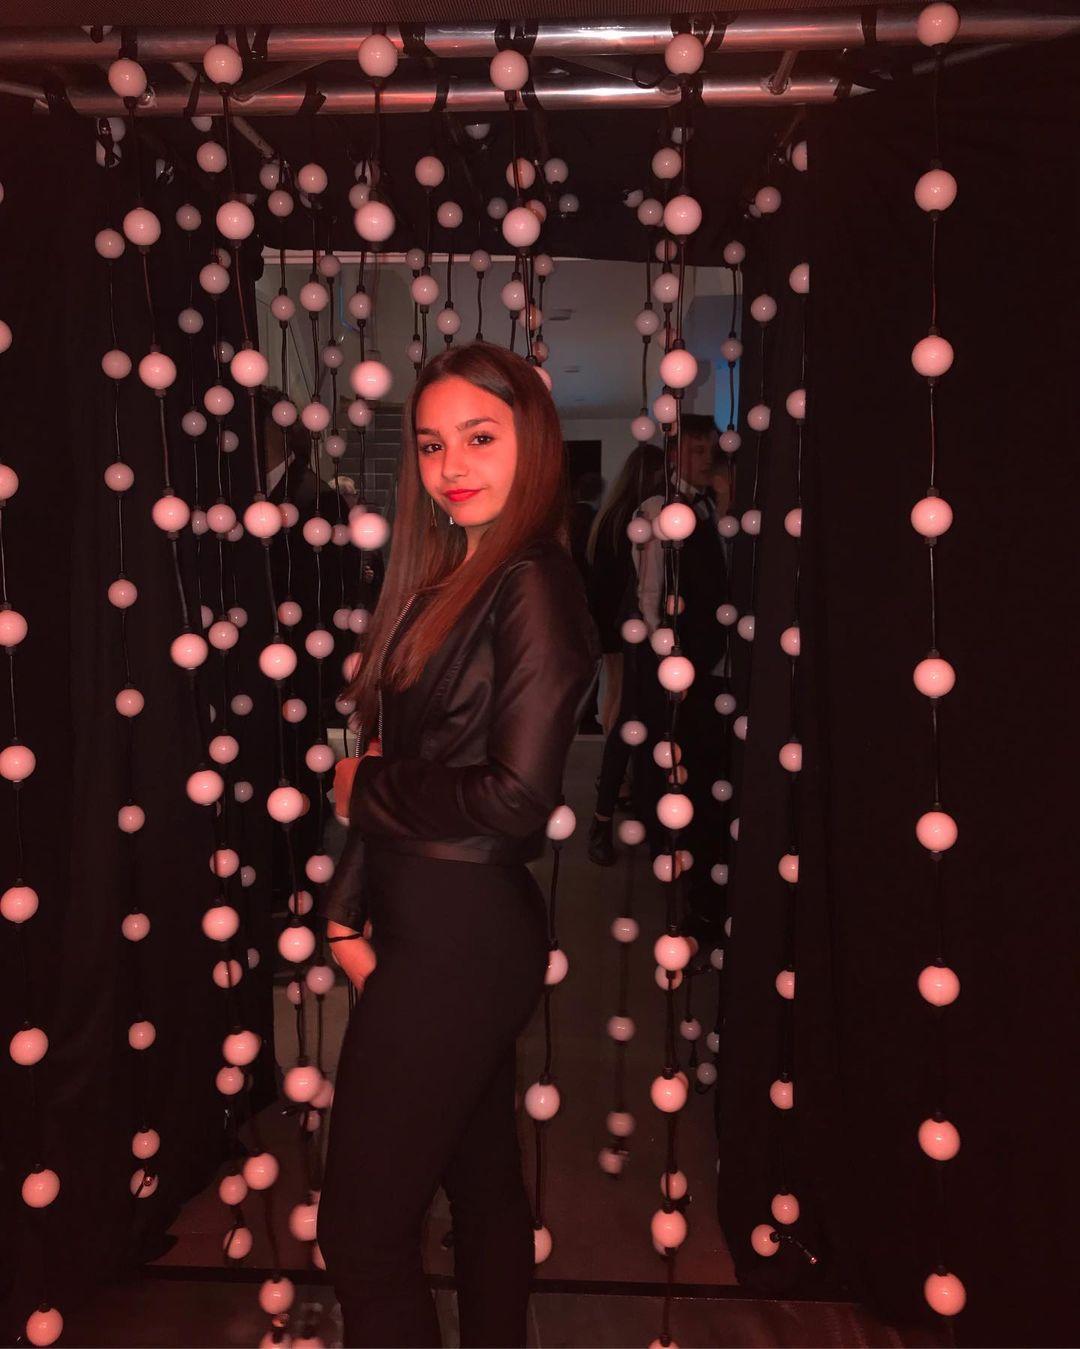 Camila-Nerea-Gonzalez-Wallpapers-Insta-Fit-Bio-2